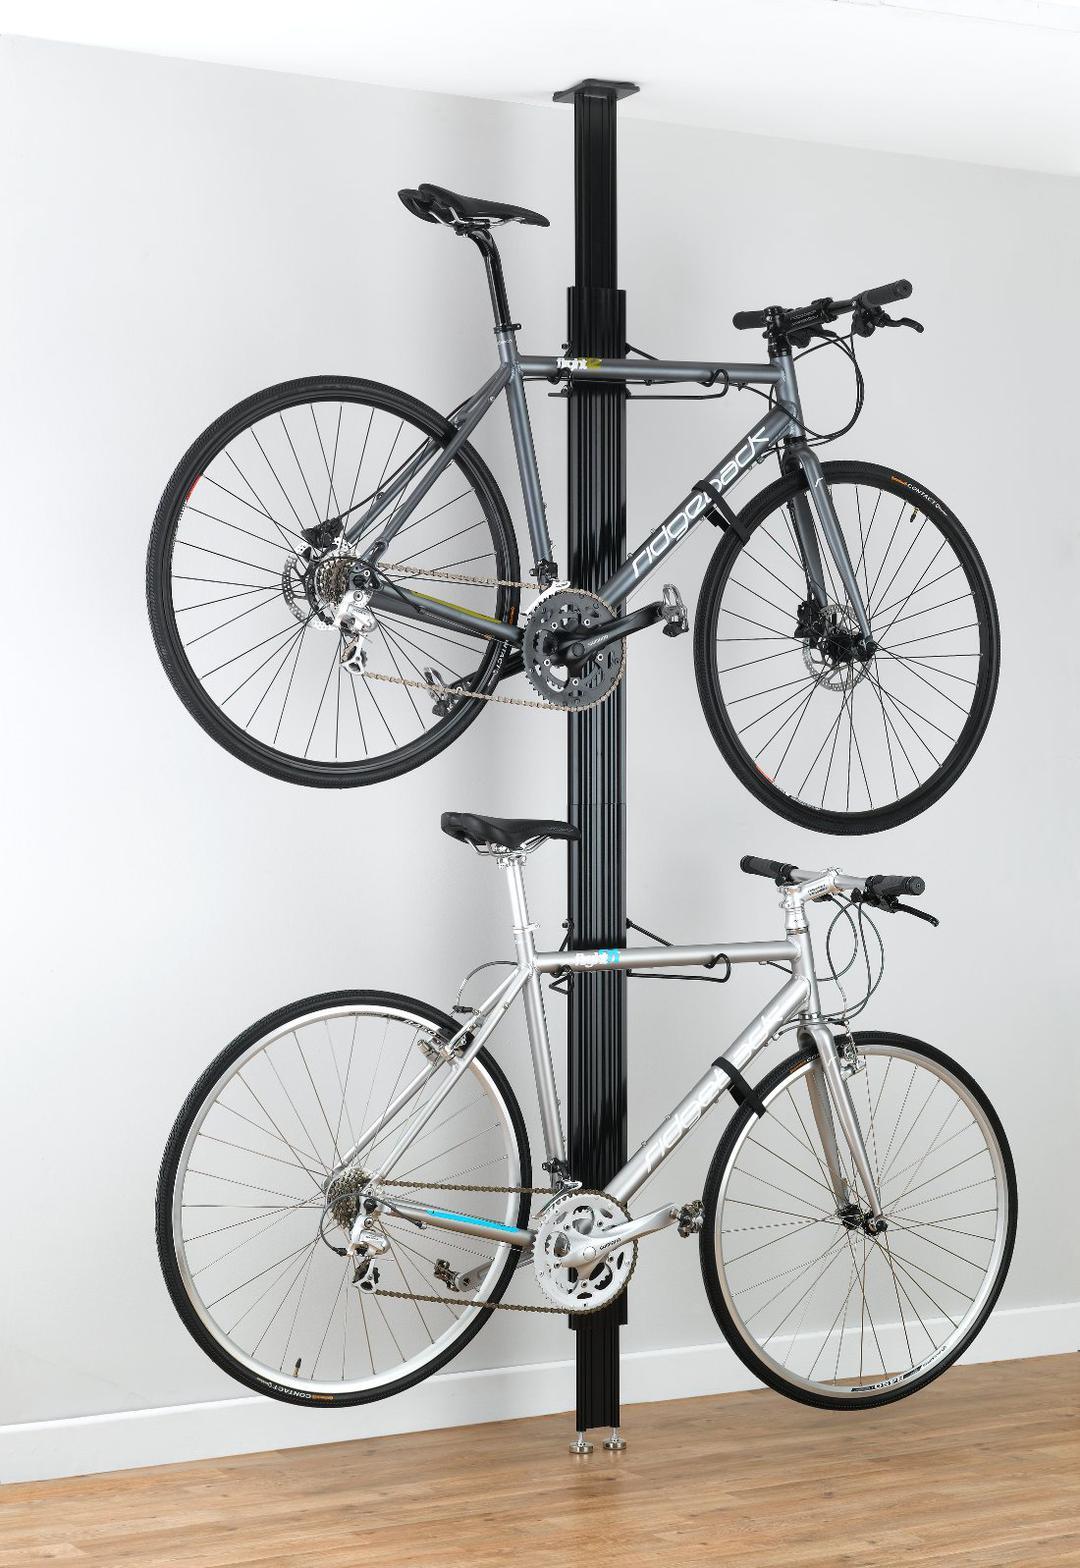 Bike Storage Racks Bike Lifts Family Bicycle Racks